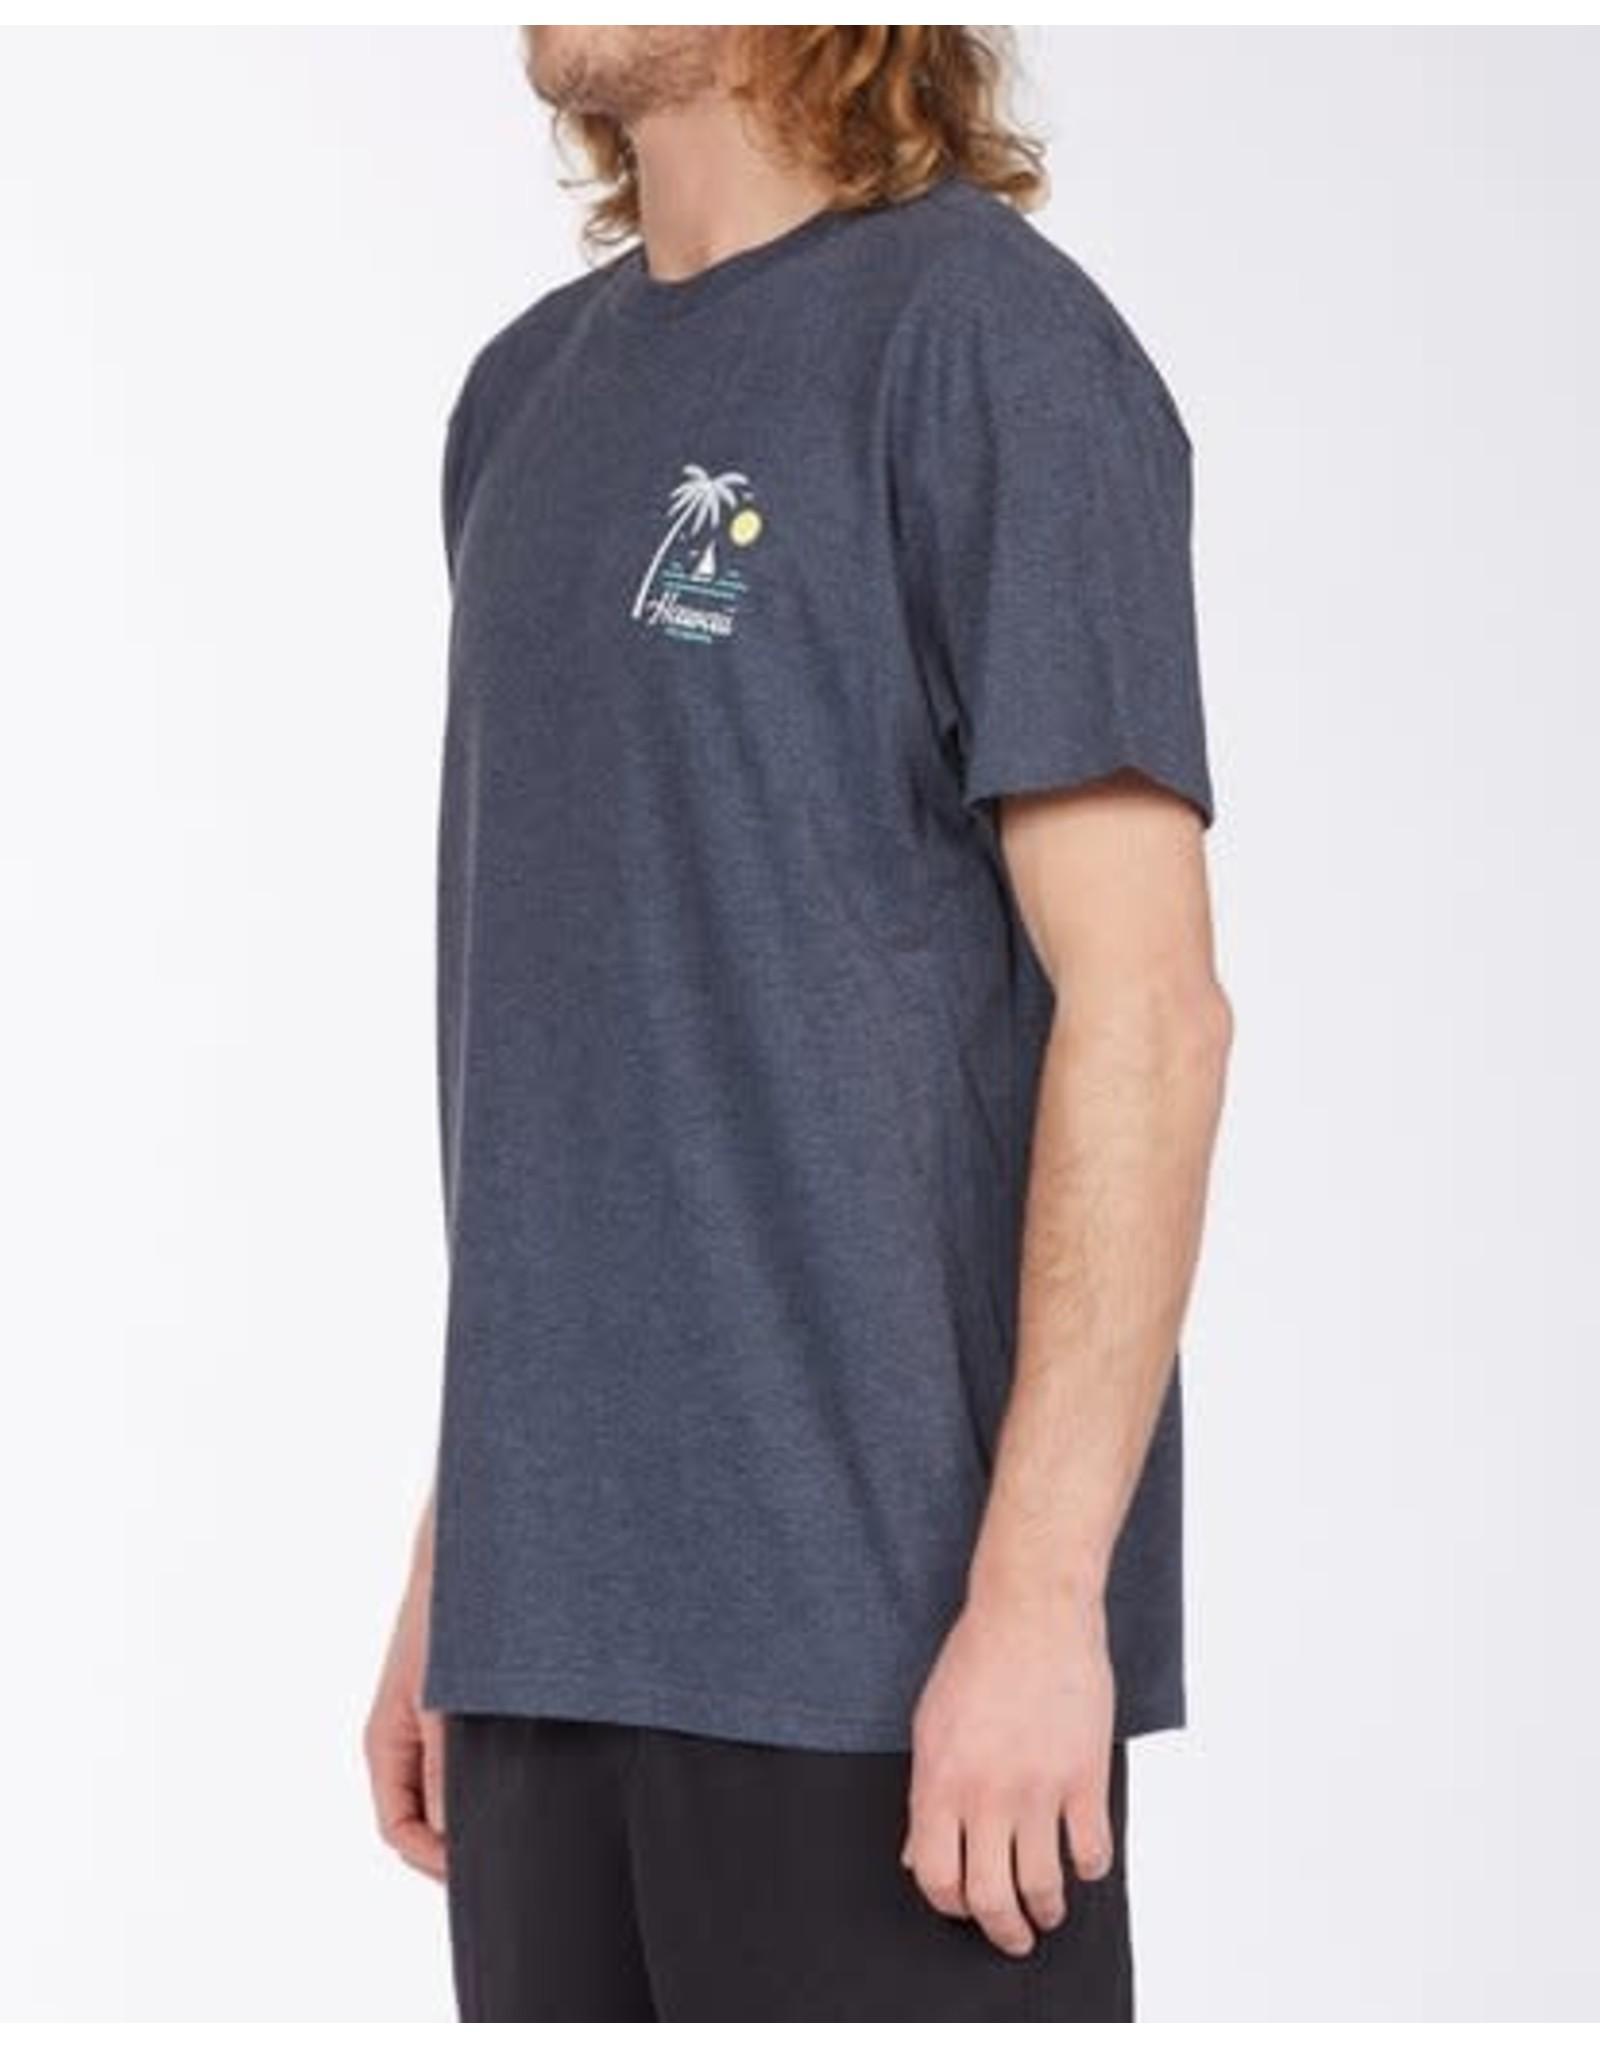 billabong Billabong - T-shirt homme daysailor hawaii indigo heather